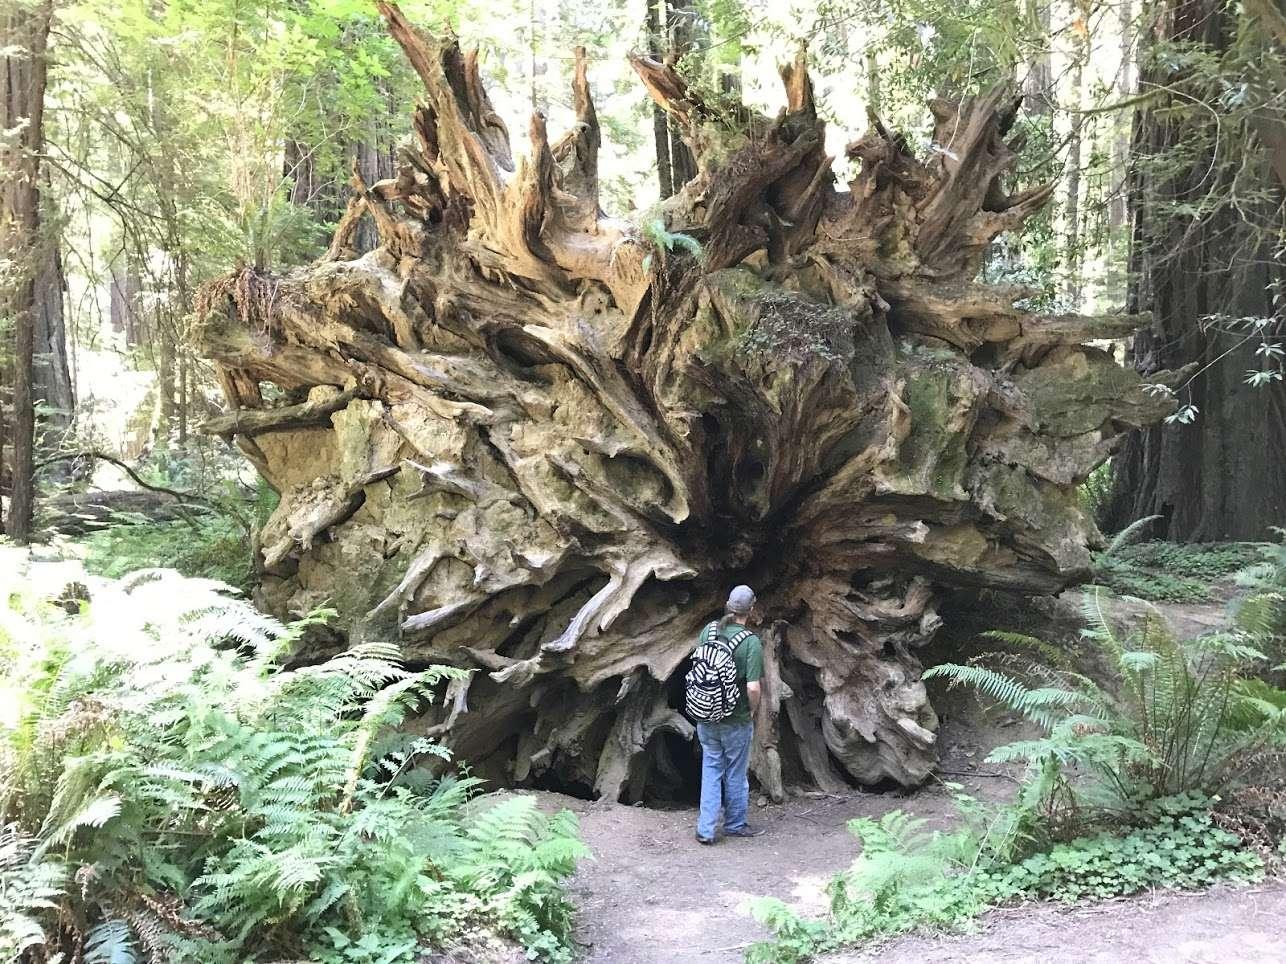 burlington campground, humboldt redwoods, ca: 6 hipcamper reviews